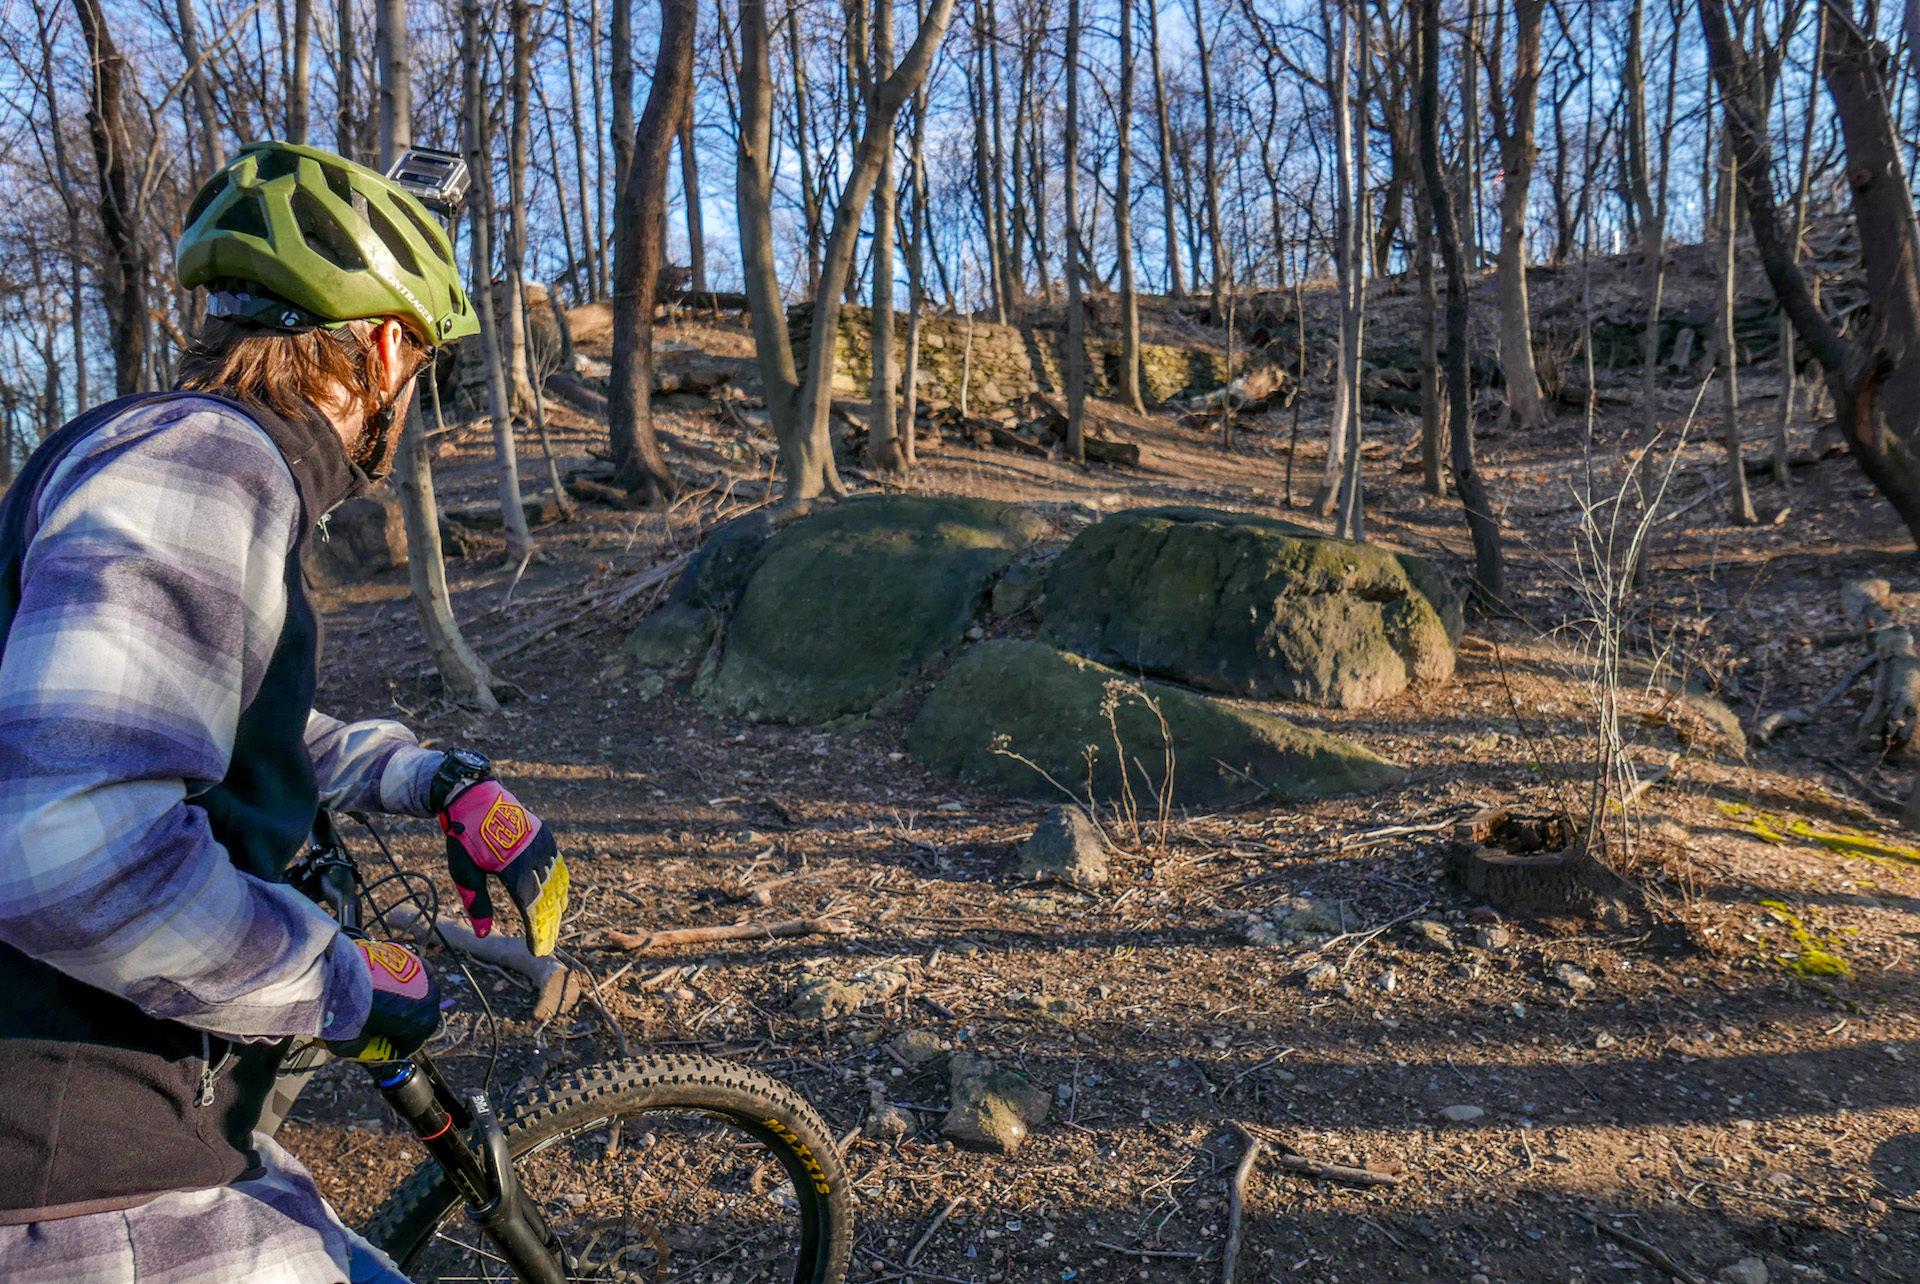 Bostjan surveys the rock obstacles.